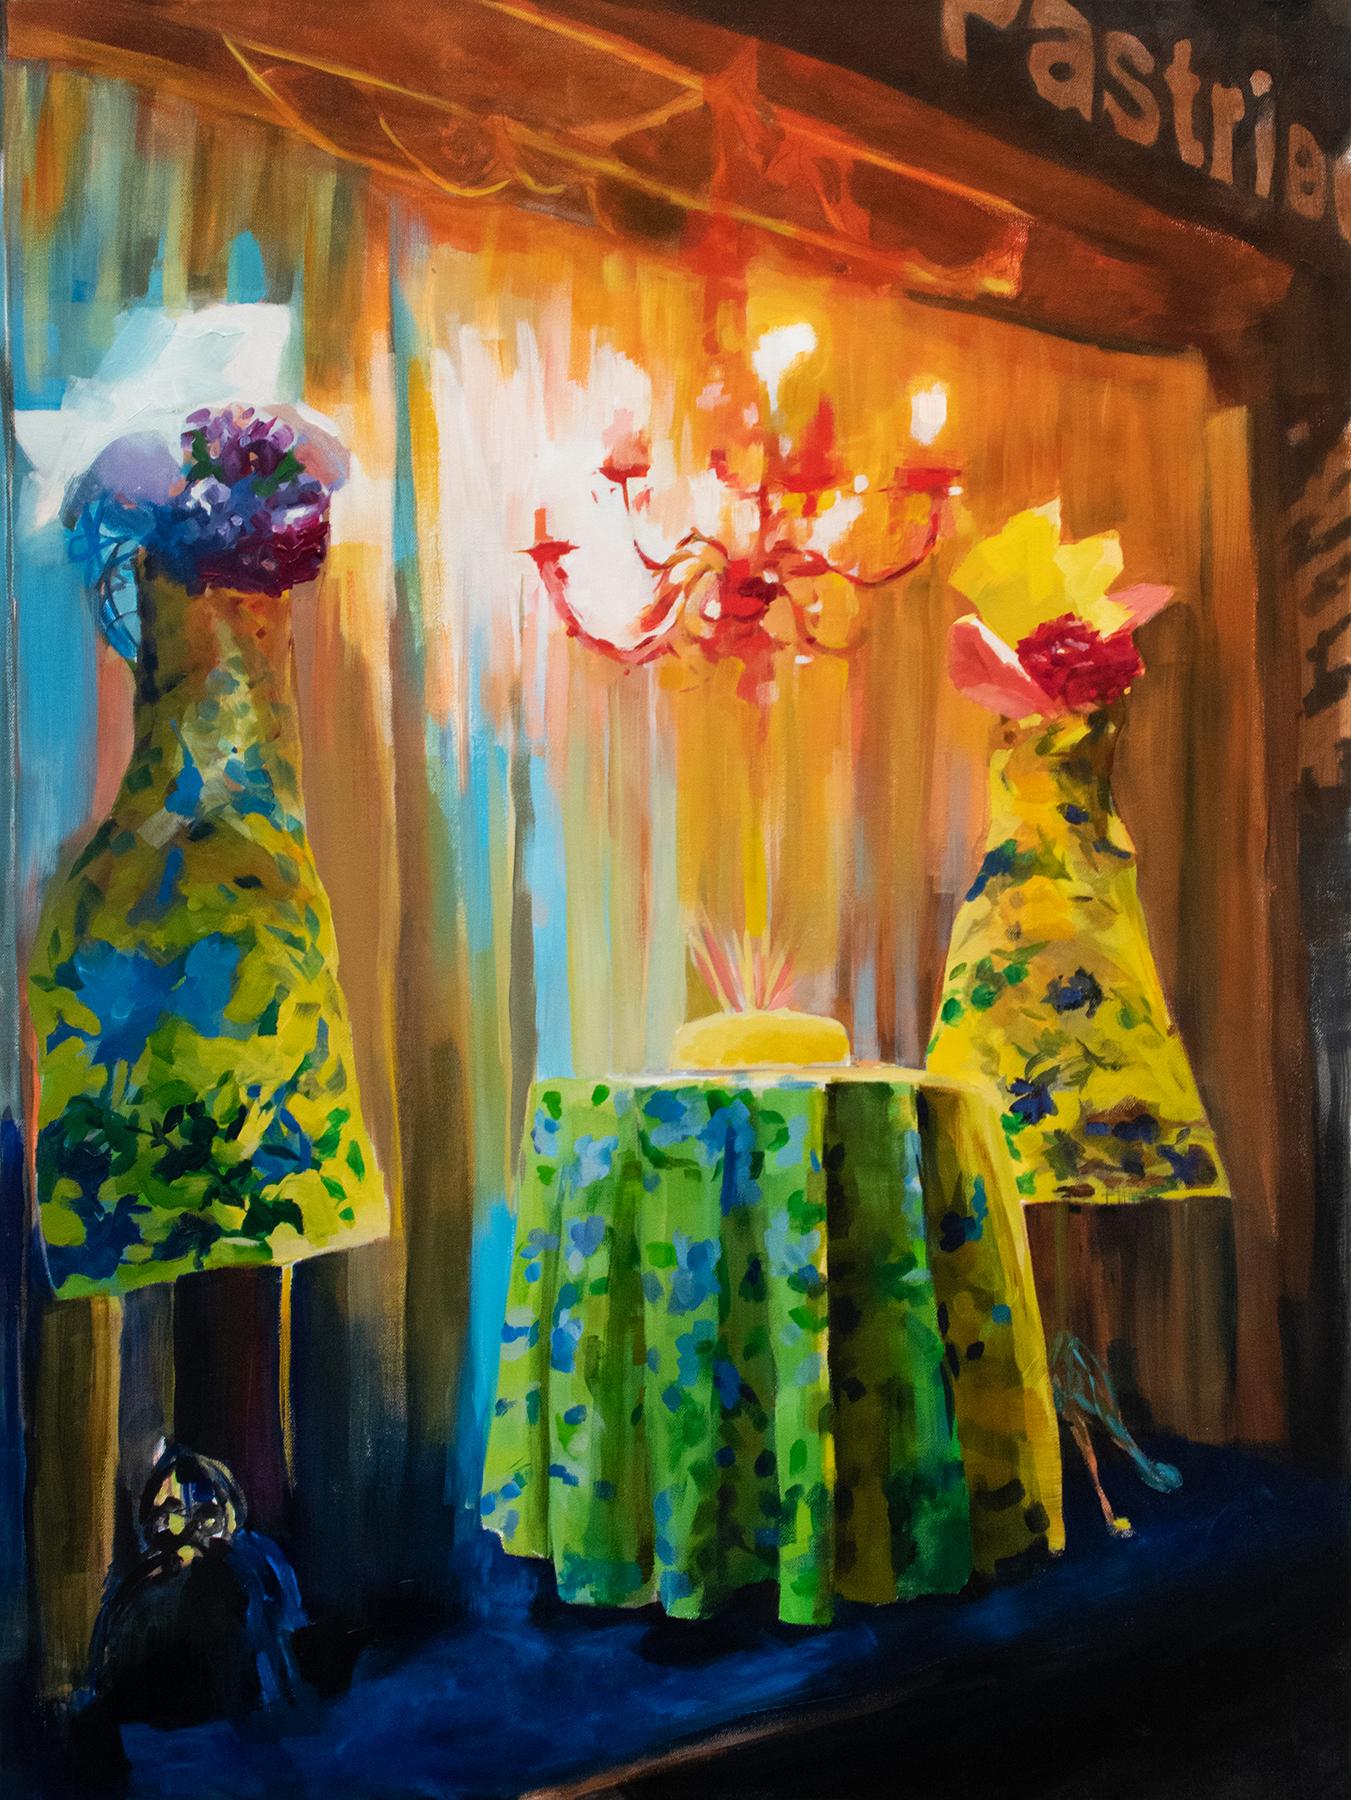 """Madame's Sugar High"", Alyssa Hood, 2019, acrylic on canvas, 40 x 30 in."